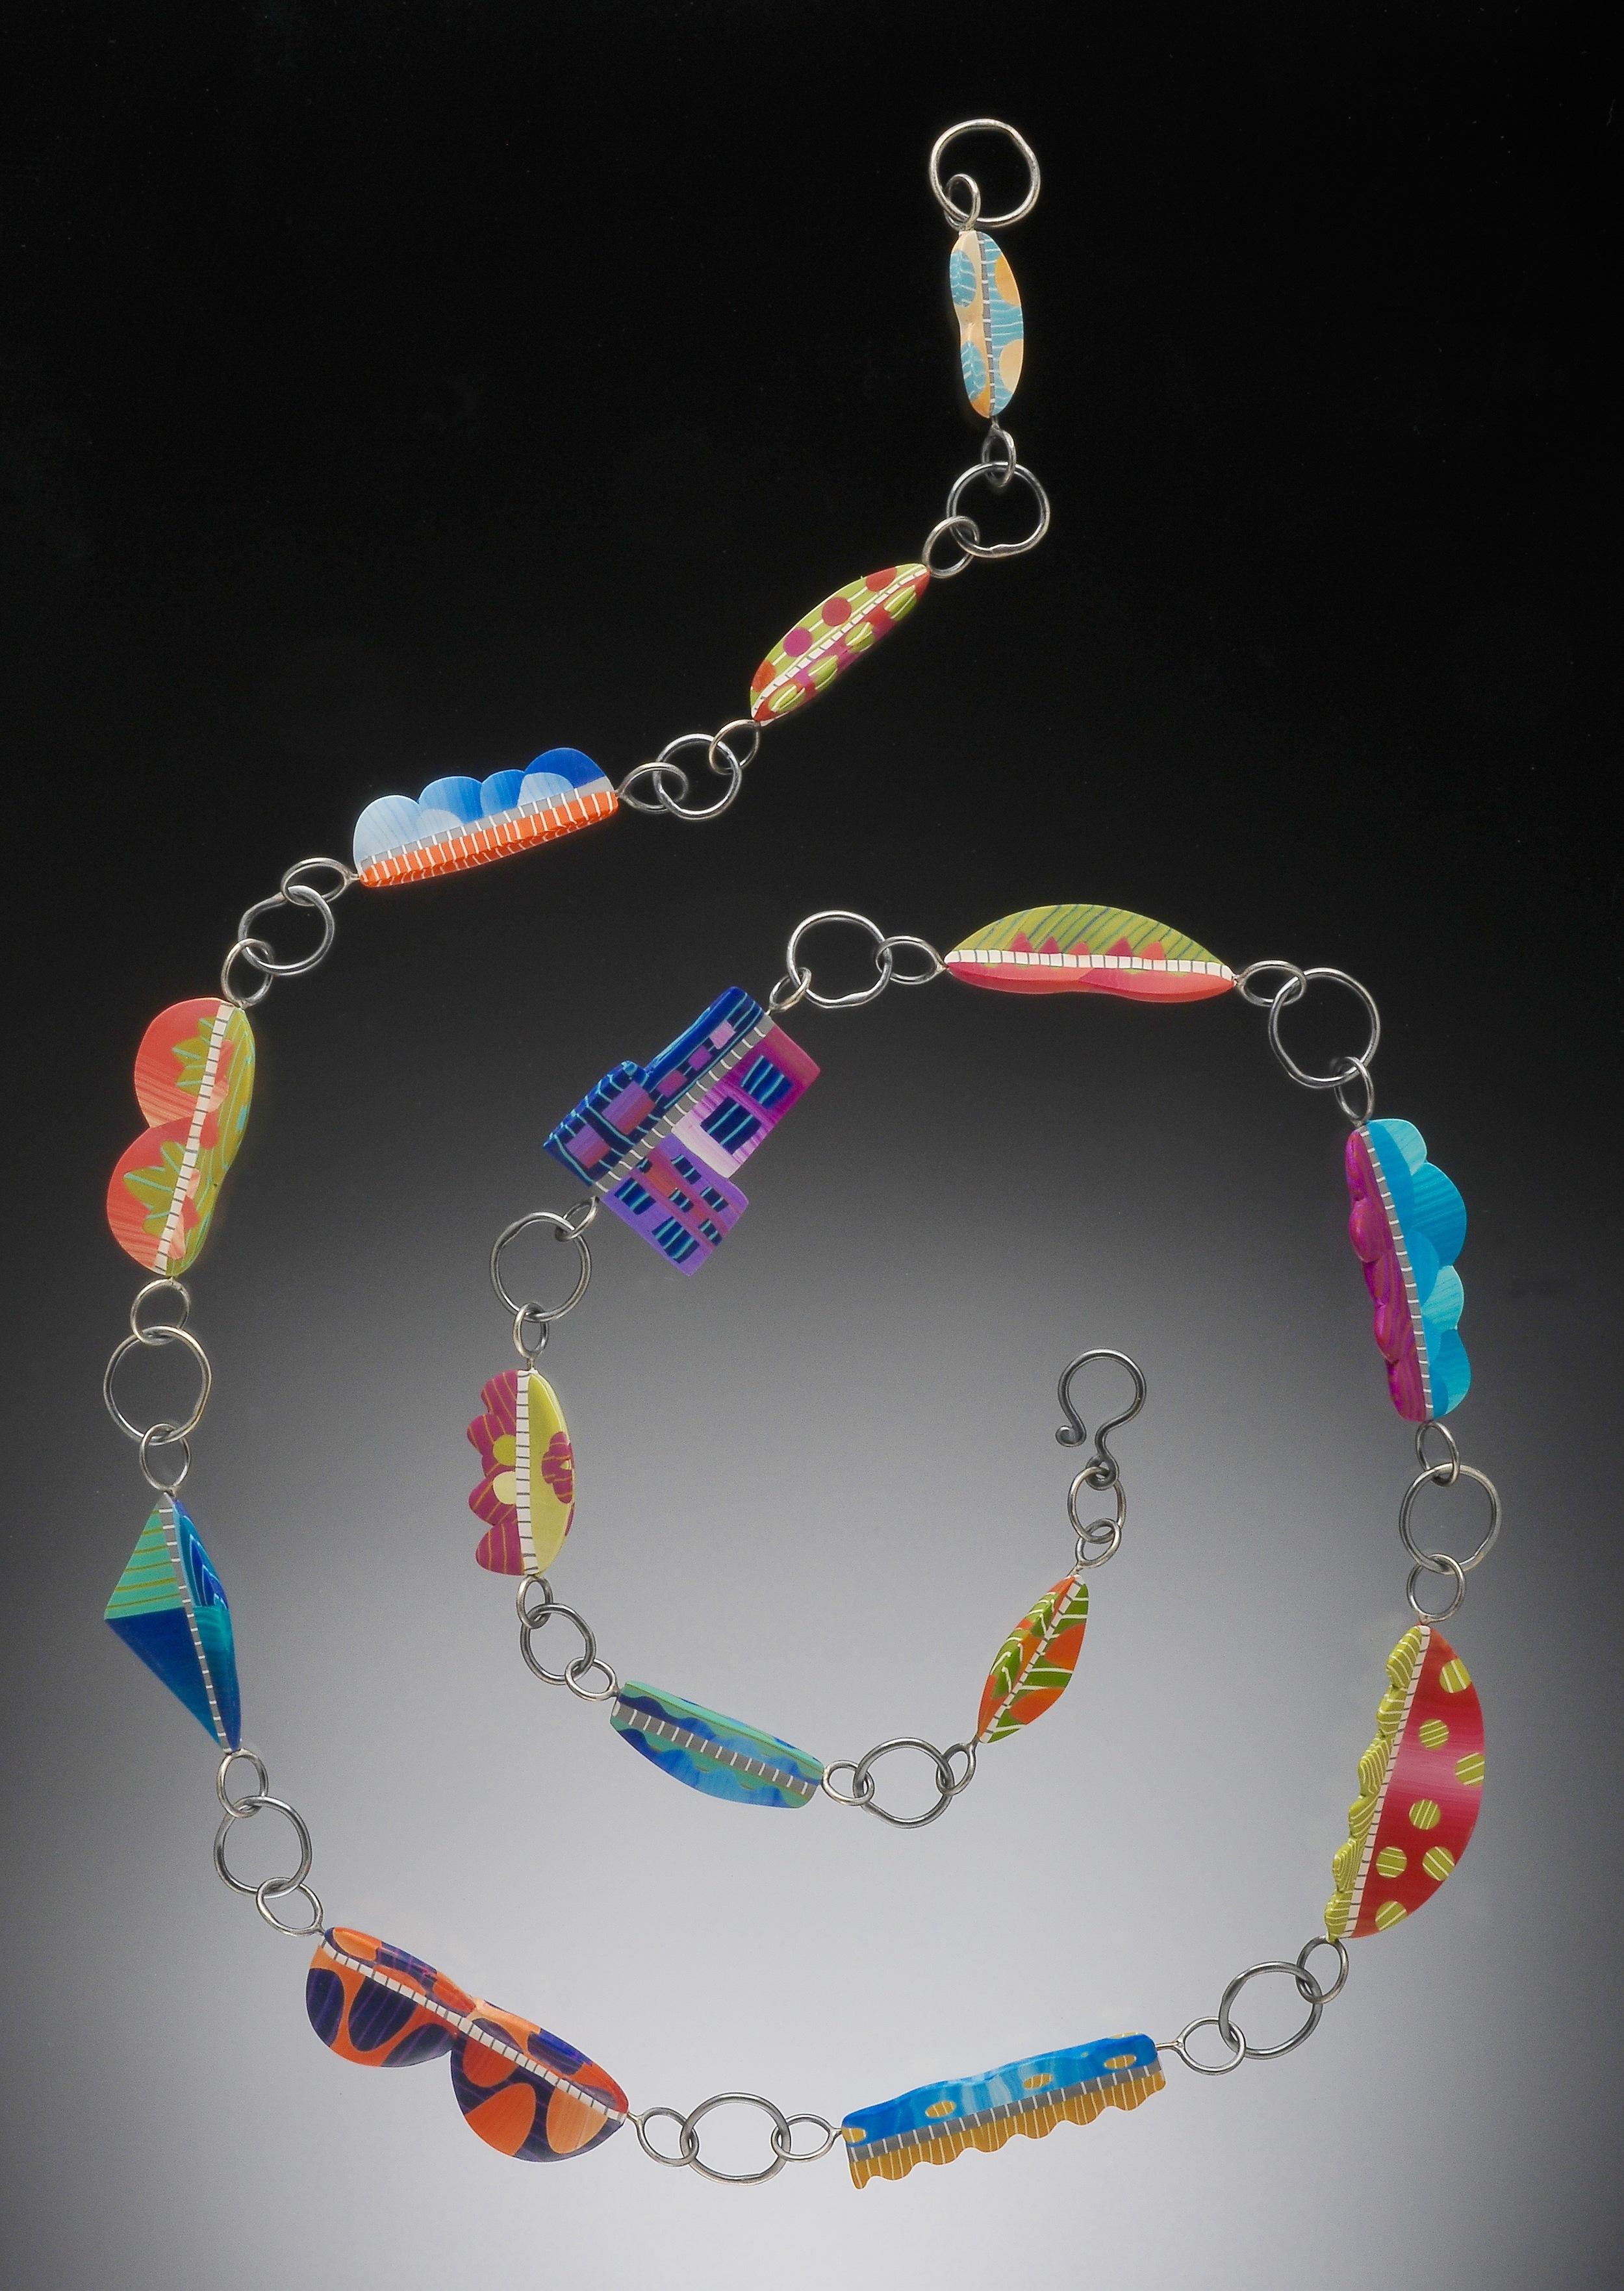 geometric songbird necklace